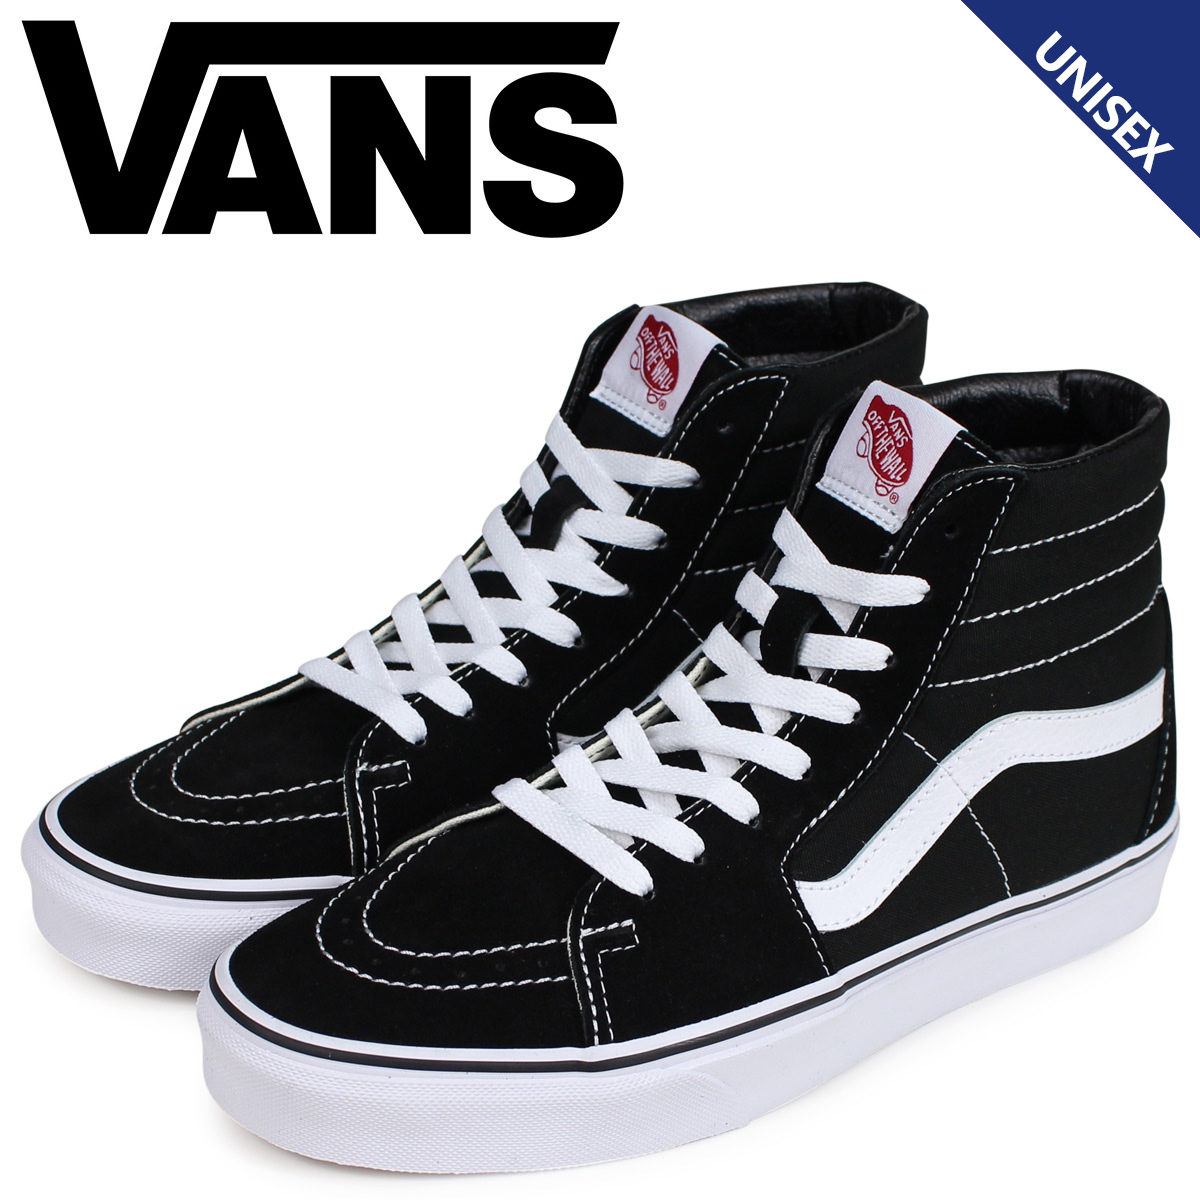 260167a576 Sugar Online Shop  Vans SK8-HI sneakers men VANS station wagons ...